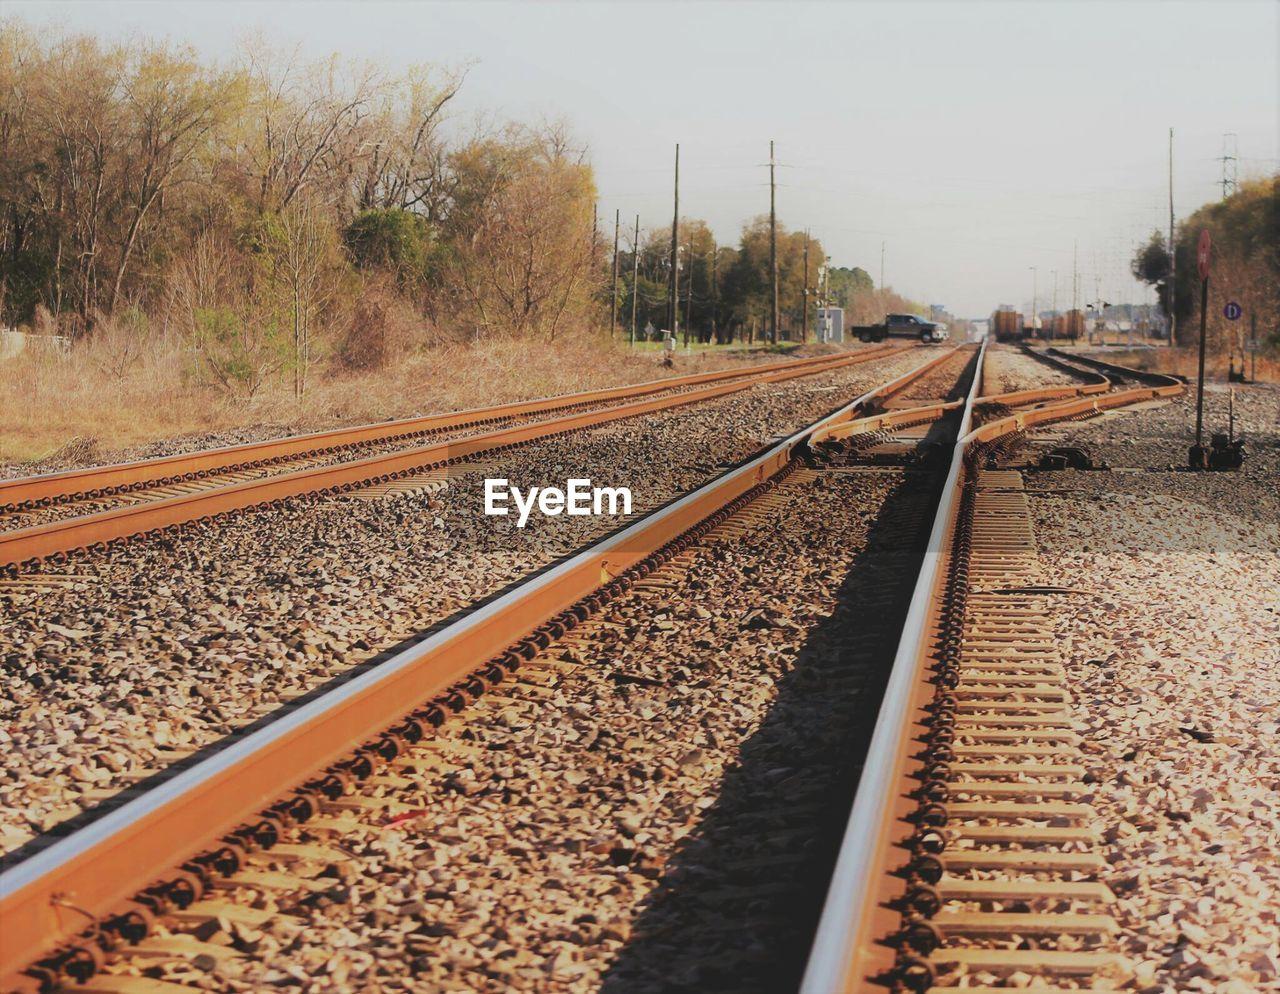 railroad track, rail transportation, transportation, day, railroad tie, railway track, no people, outdoors, travel, the way forward, clear sky, sky, tree, nature